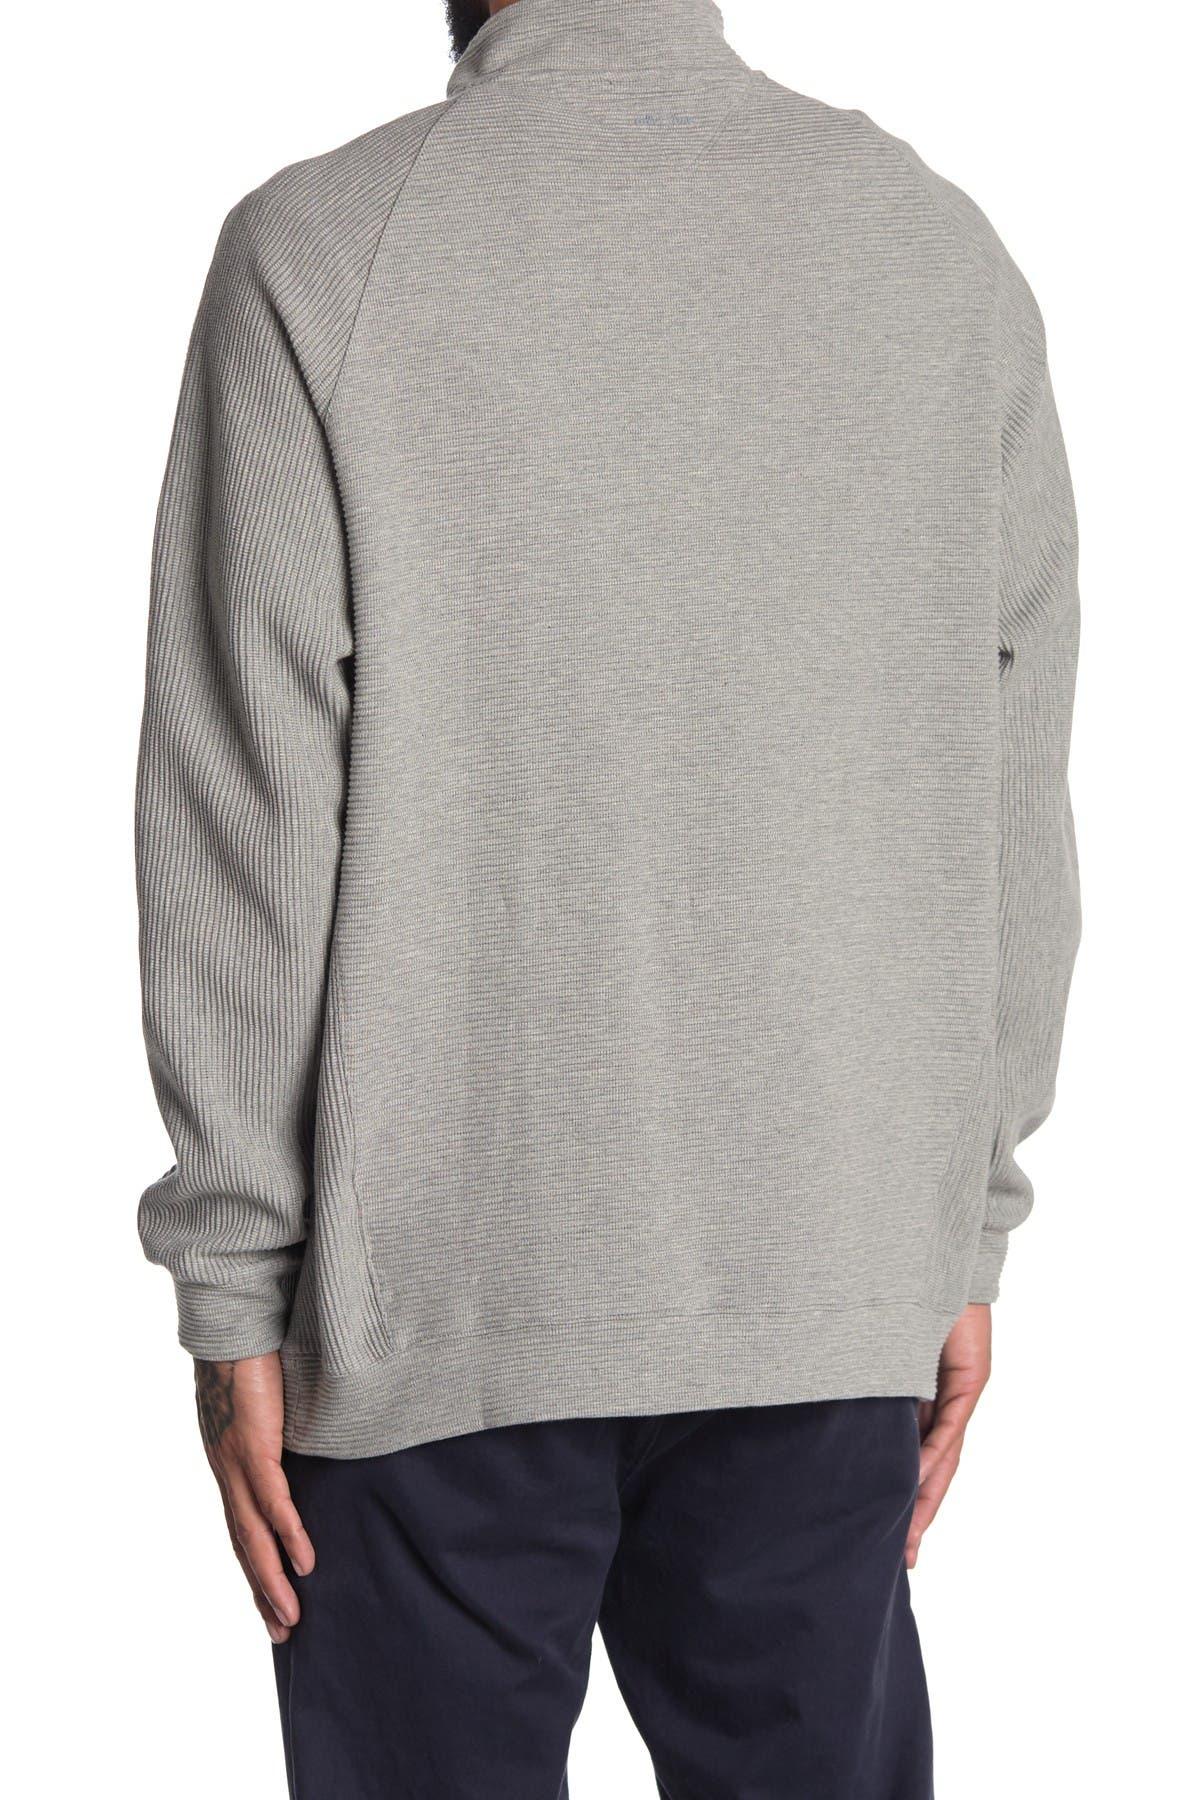 Image of Adidas Golf Cozy 1/4 Zip Pullover